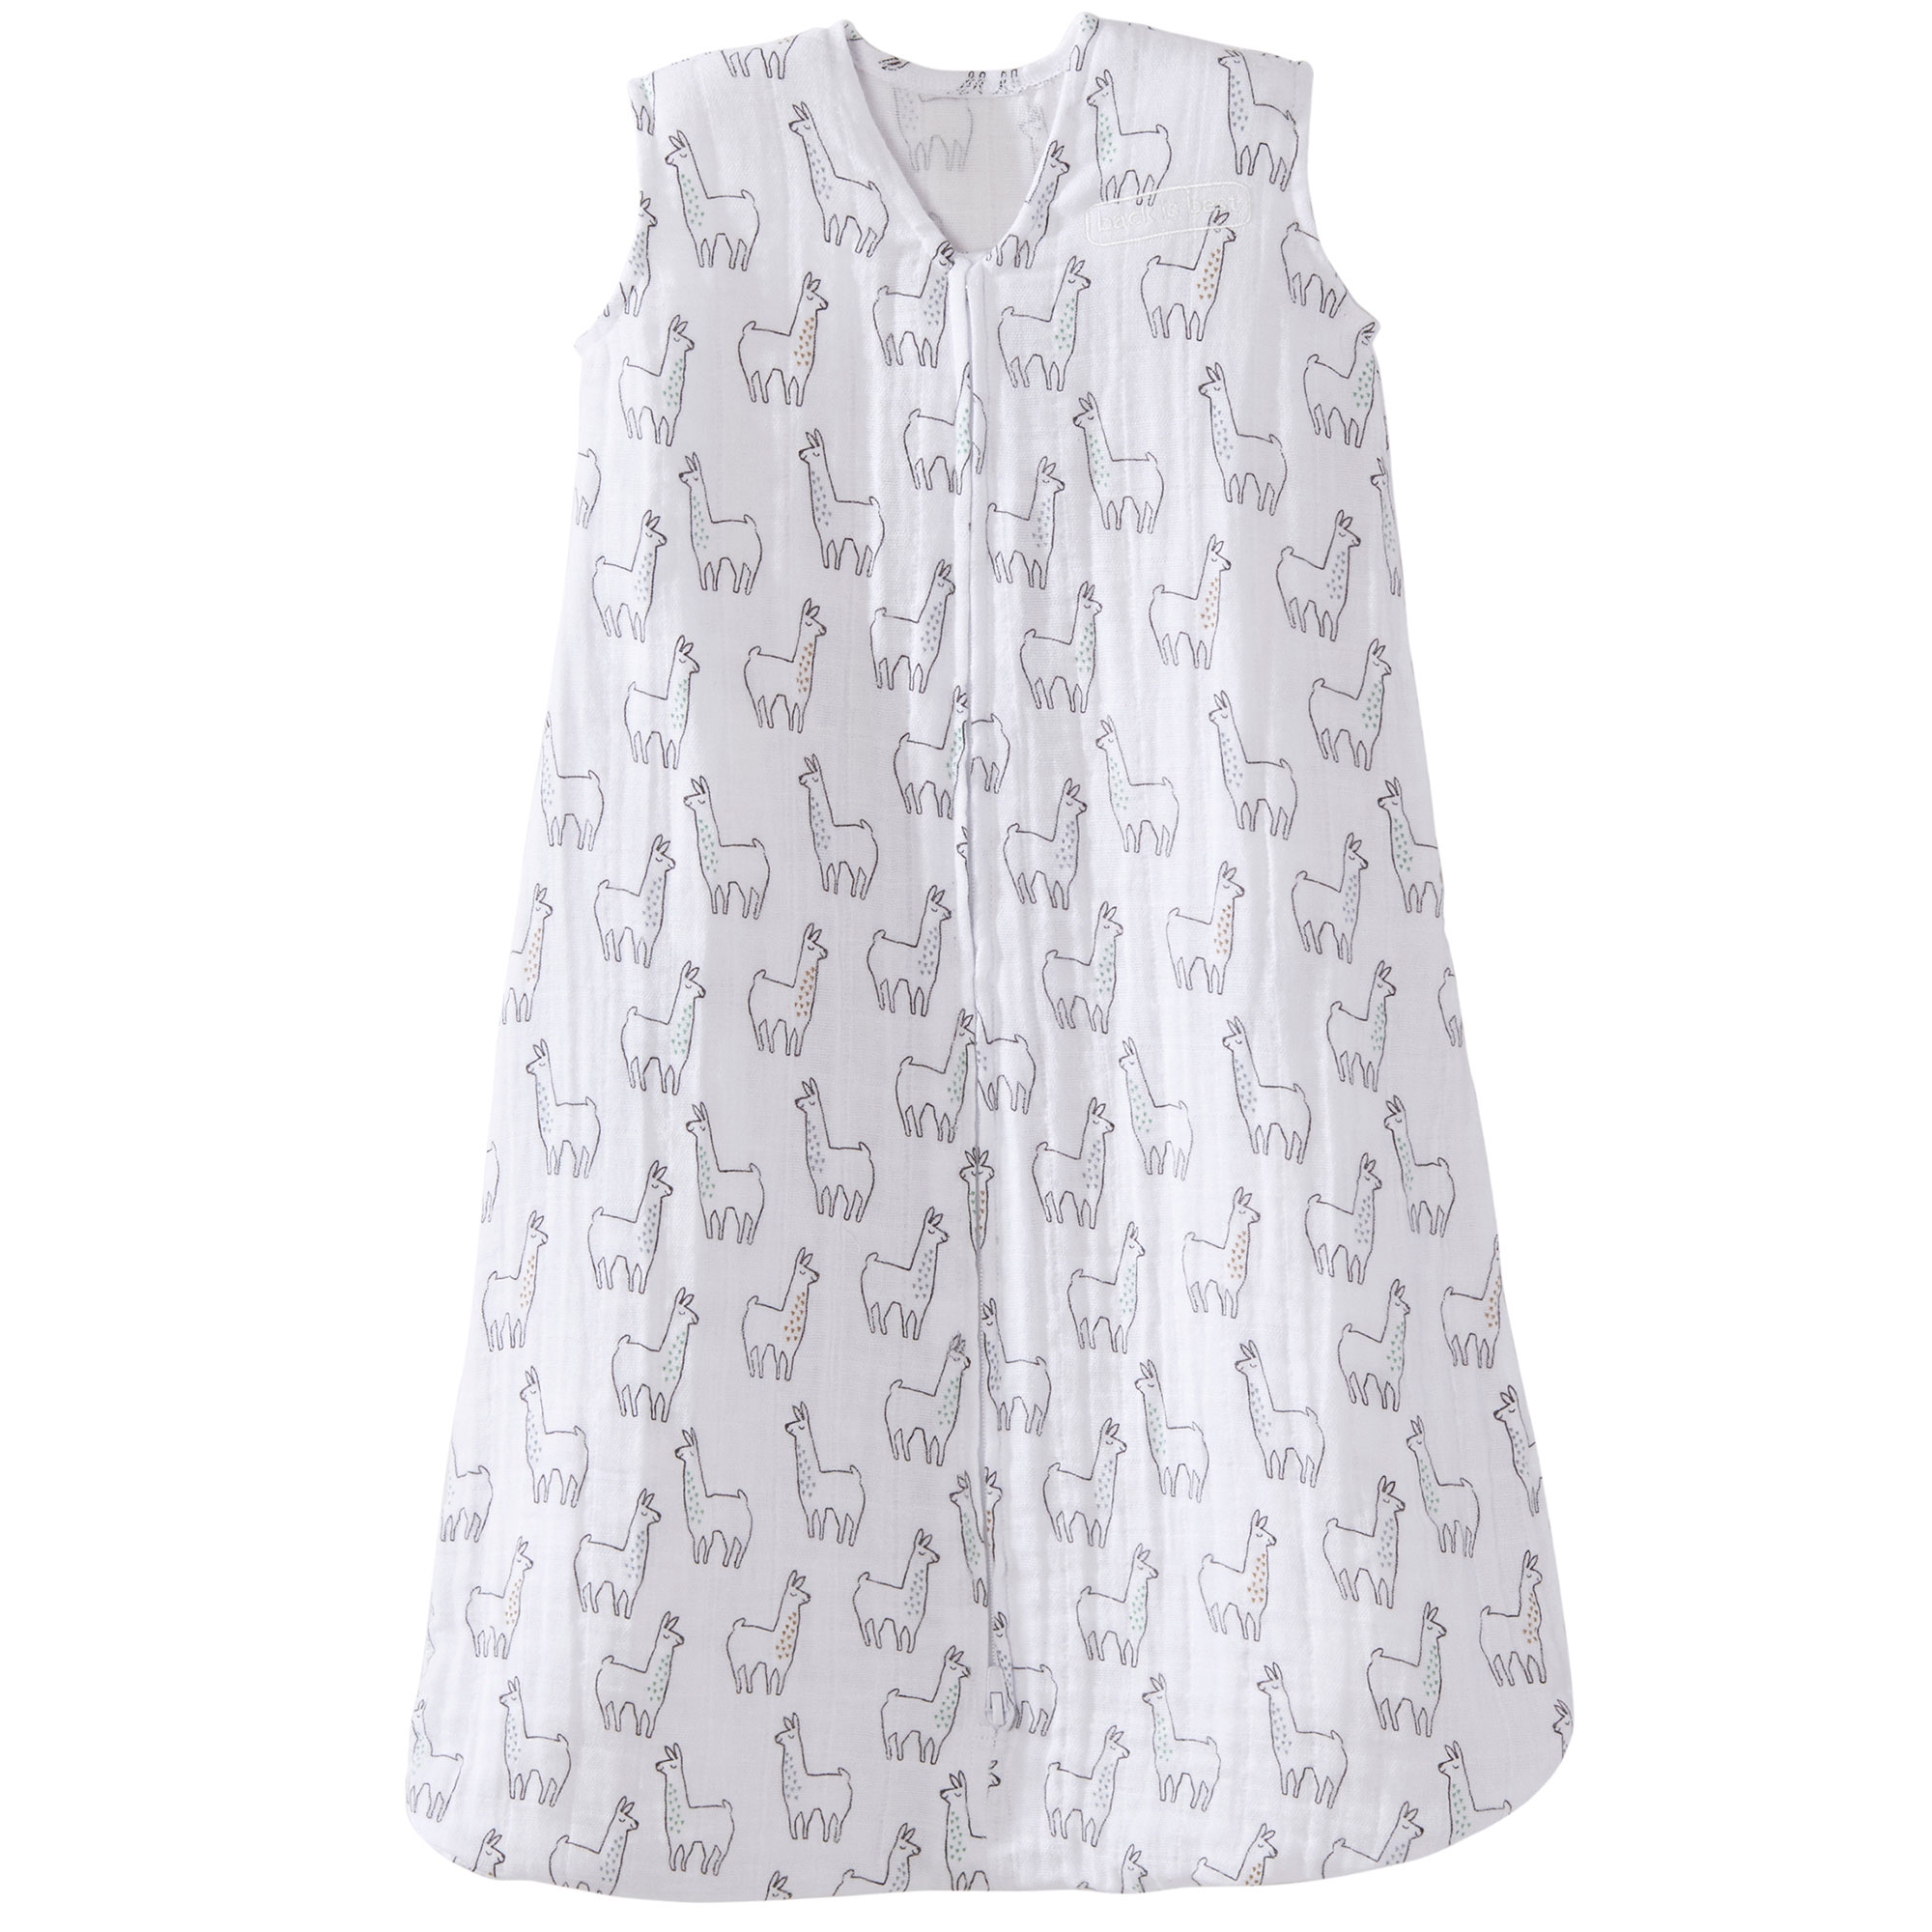 Halo 100% Cotton Muslin Baby Sleepsack Wearable Blanket, Llama Print, Extra-Large